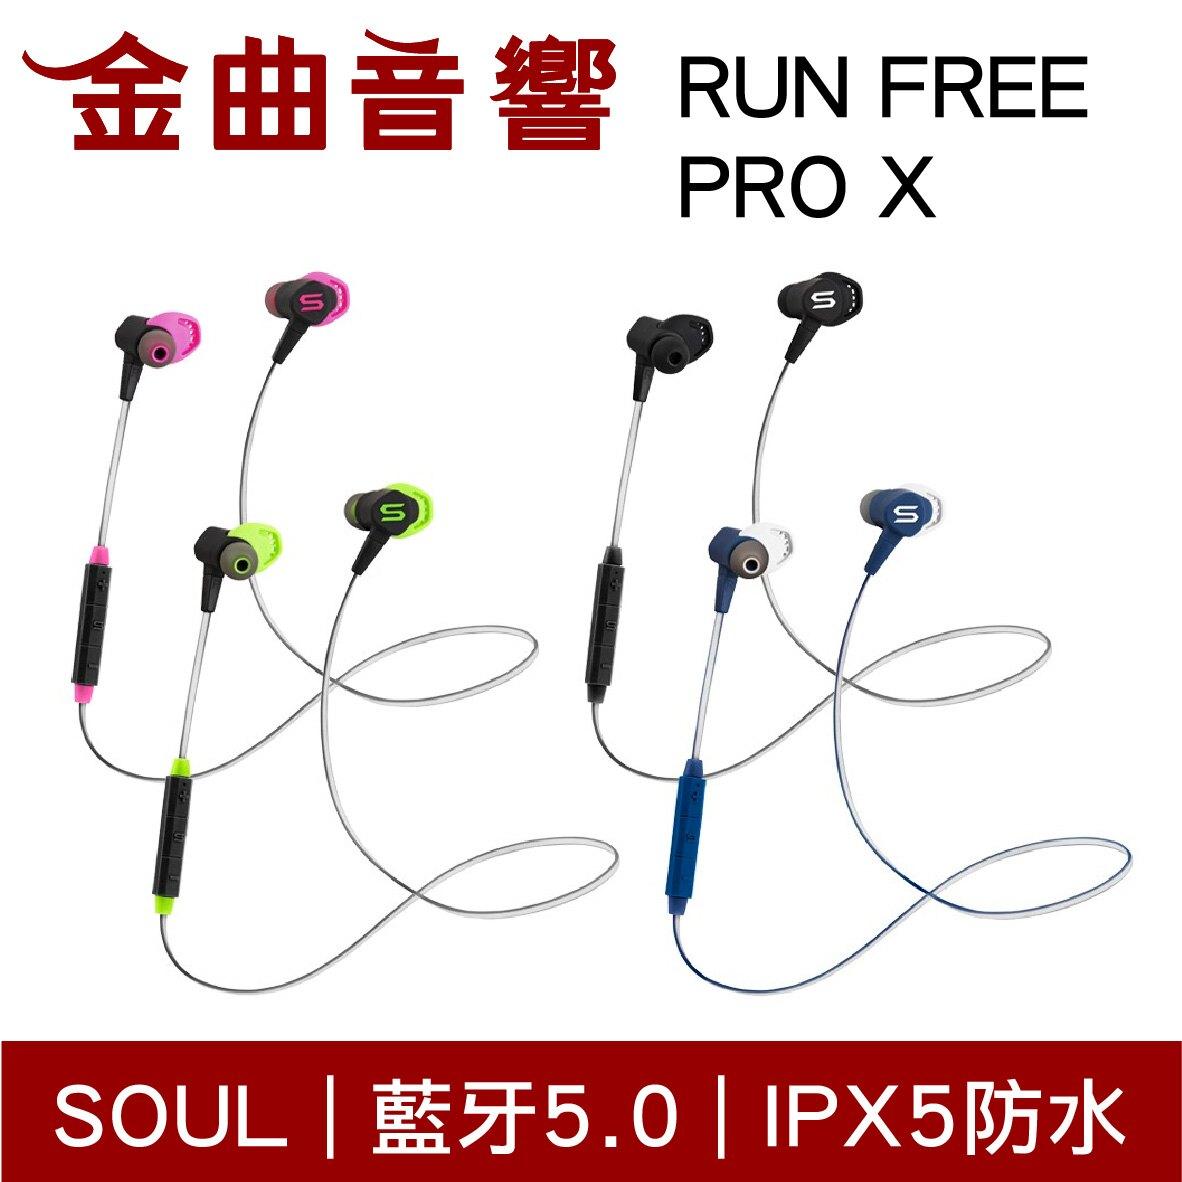 SOUL RUN FREE PRO X 綠色 運動型 防水 藍芽 耳機 金曲音響